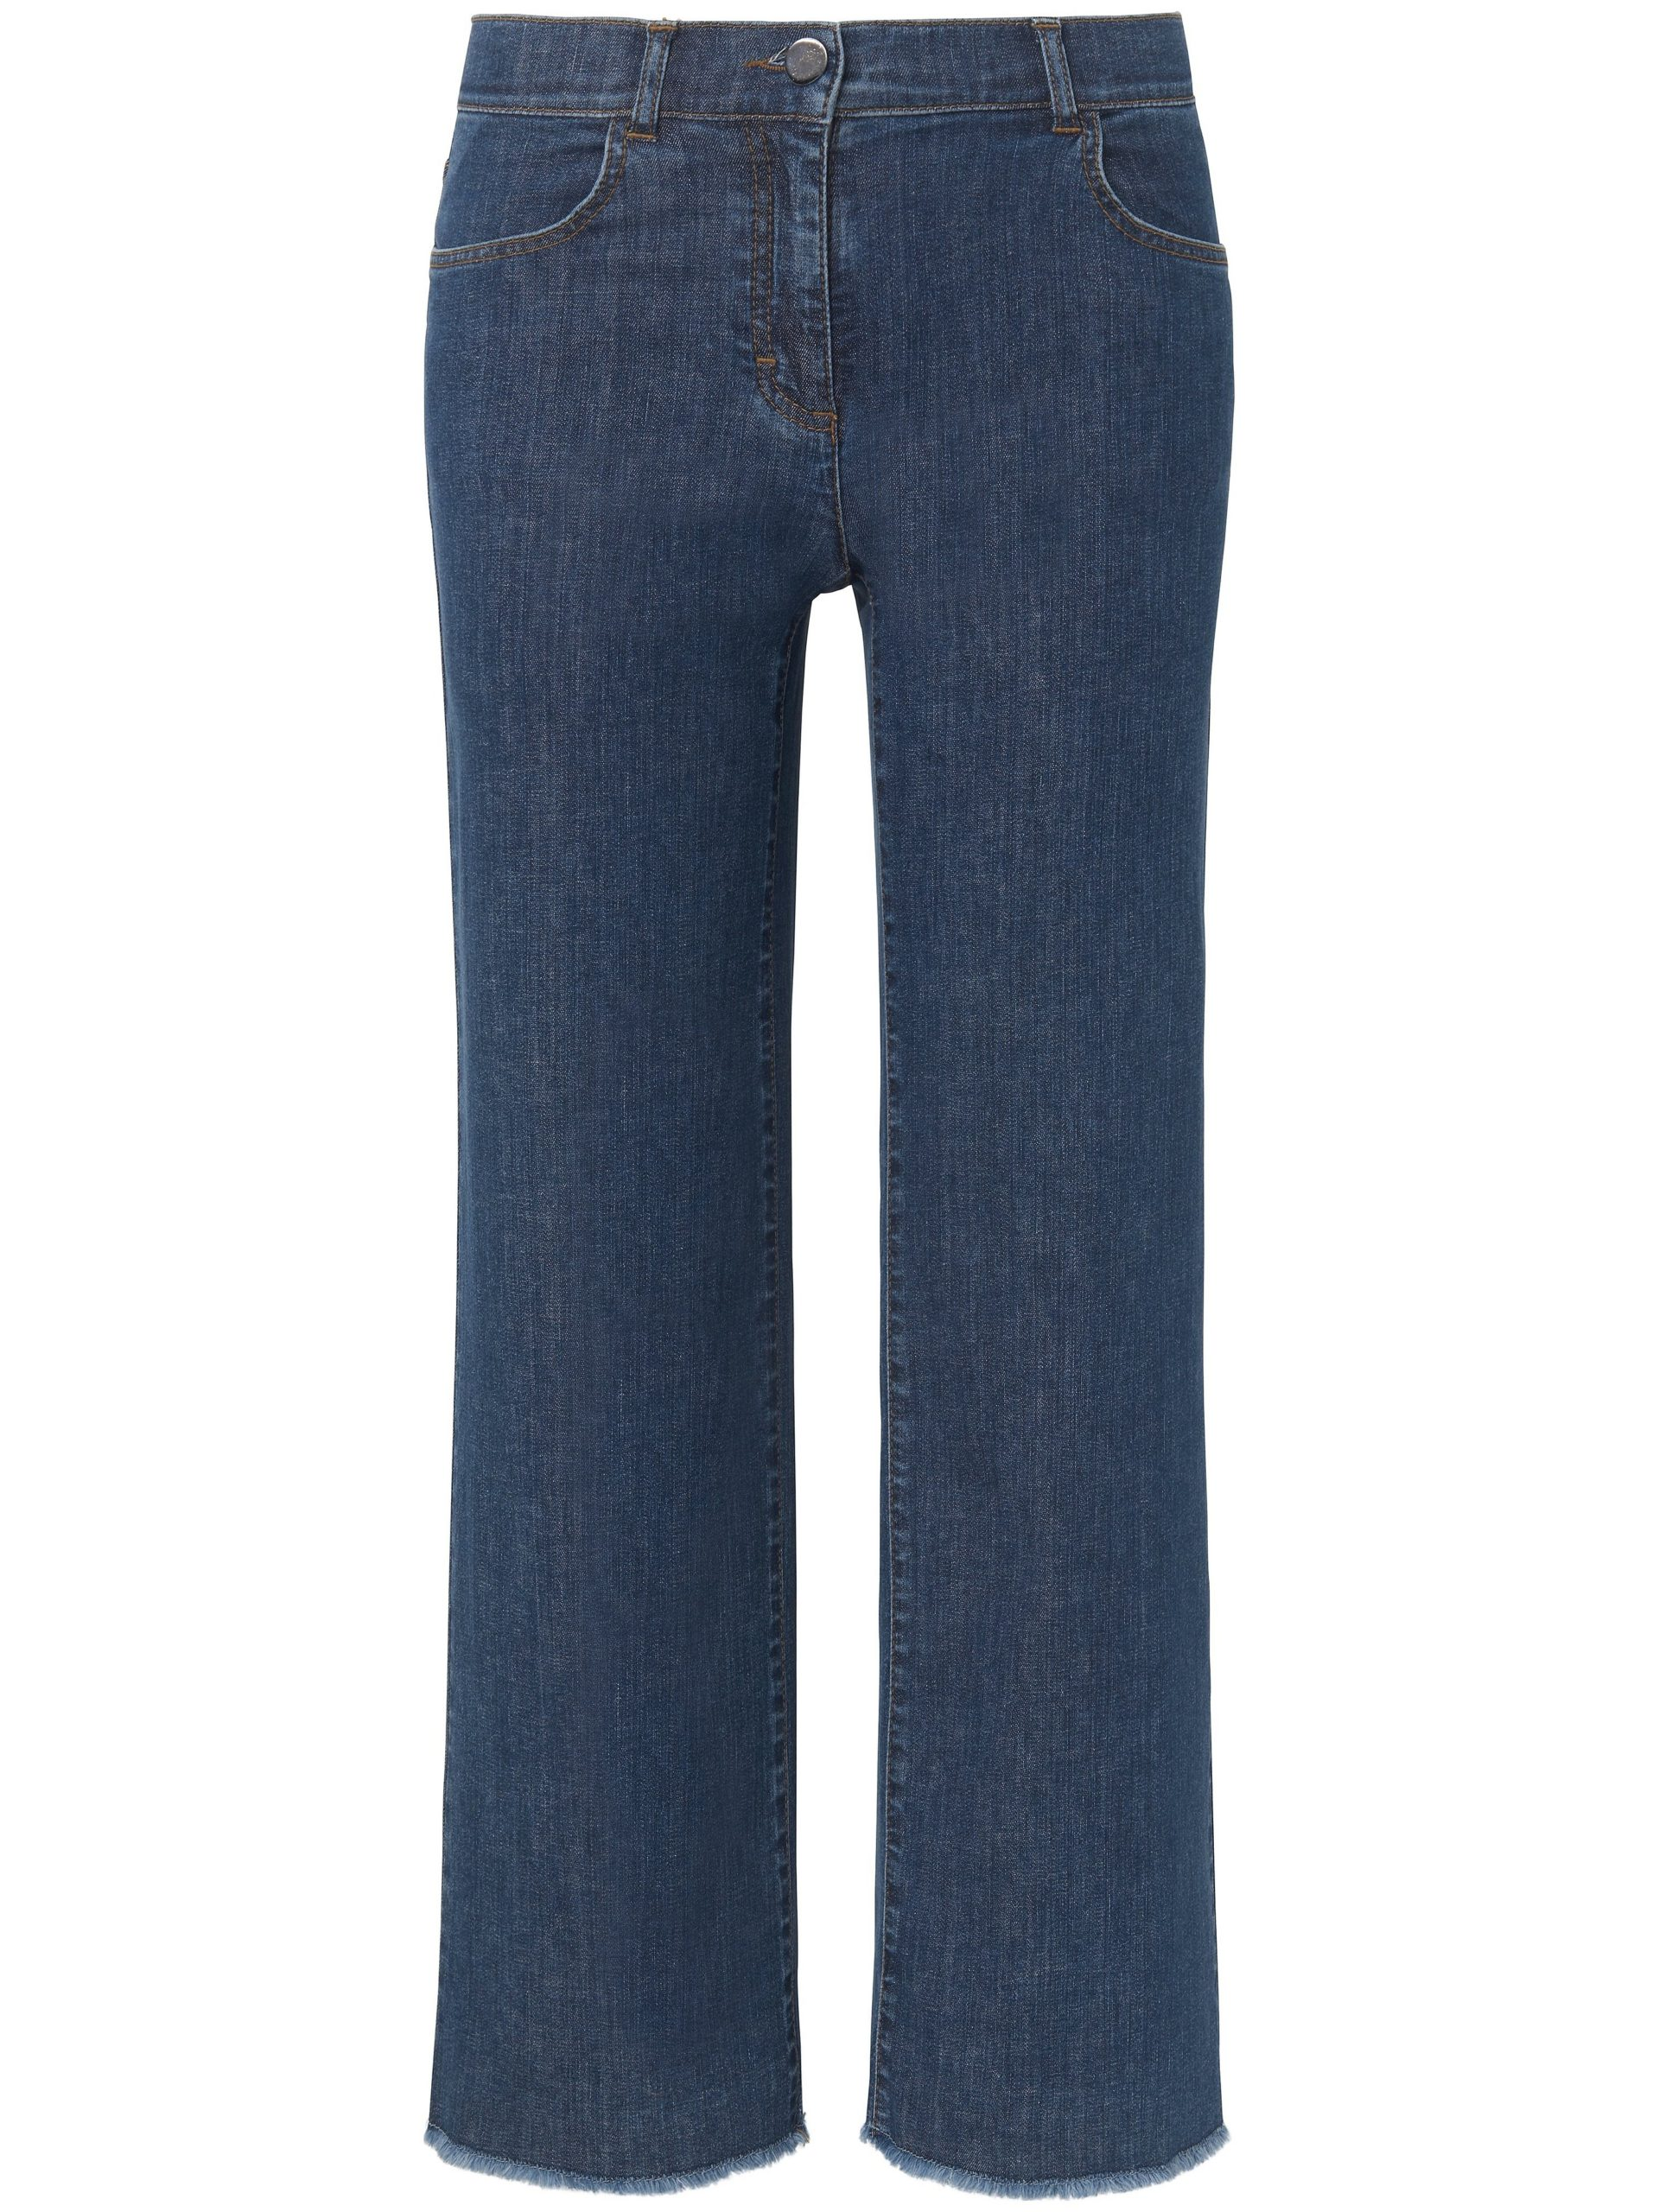 7/8-jeans-culotte franjezoom Van DAY.LIKE denim Kopen